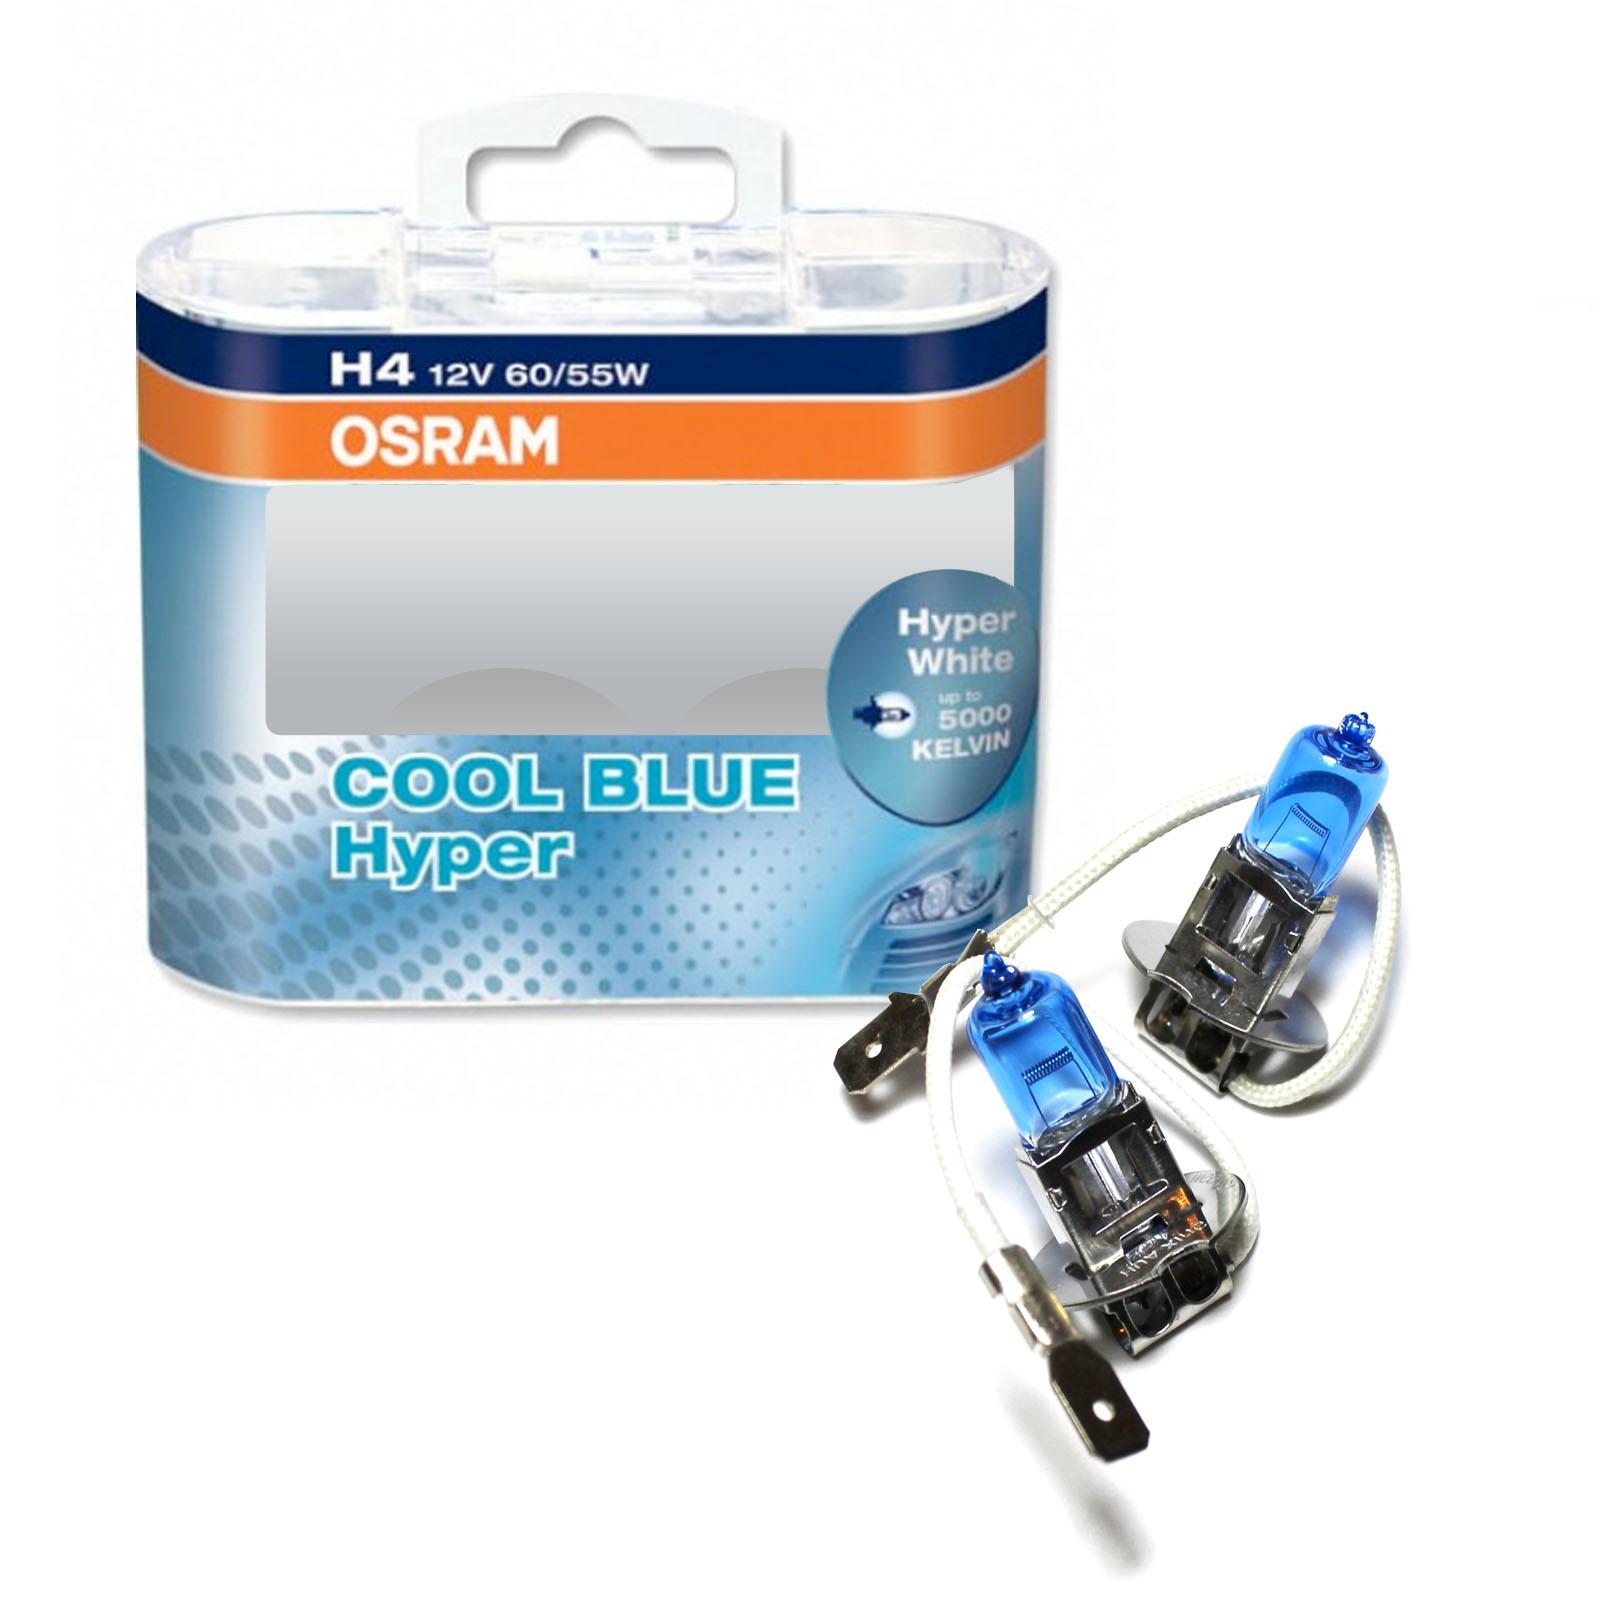 osram cool blue hyper fog light bulbs front spot lamps. Black Bedroom Furniture Sets. Home Design Ideas